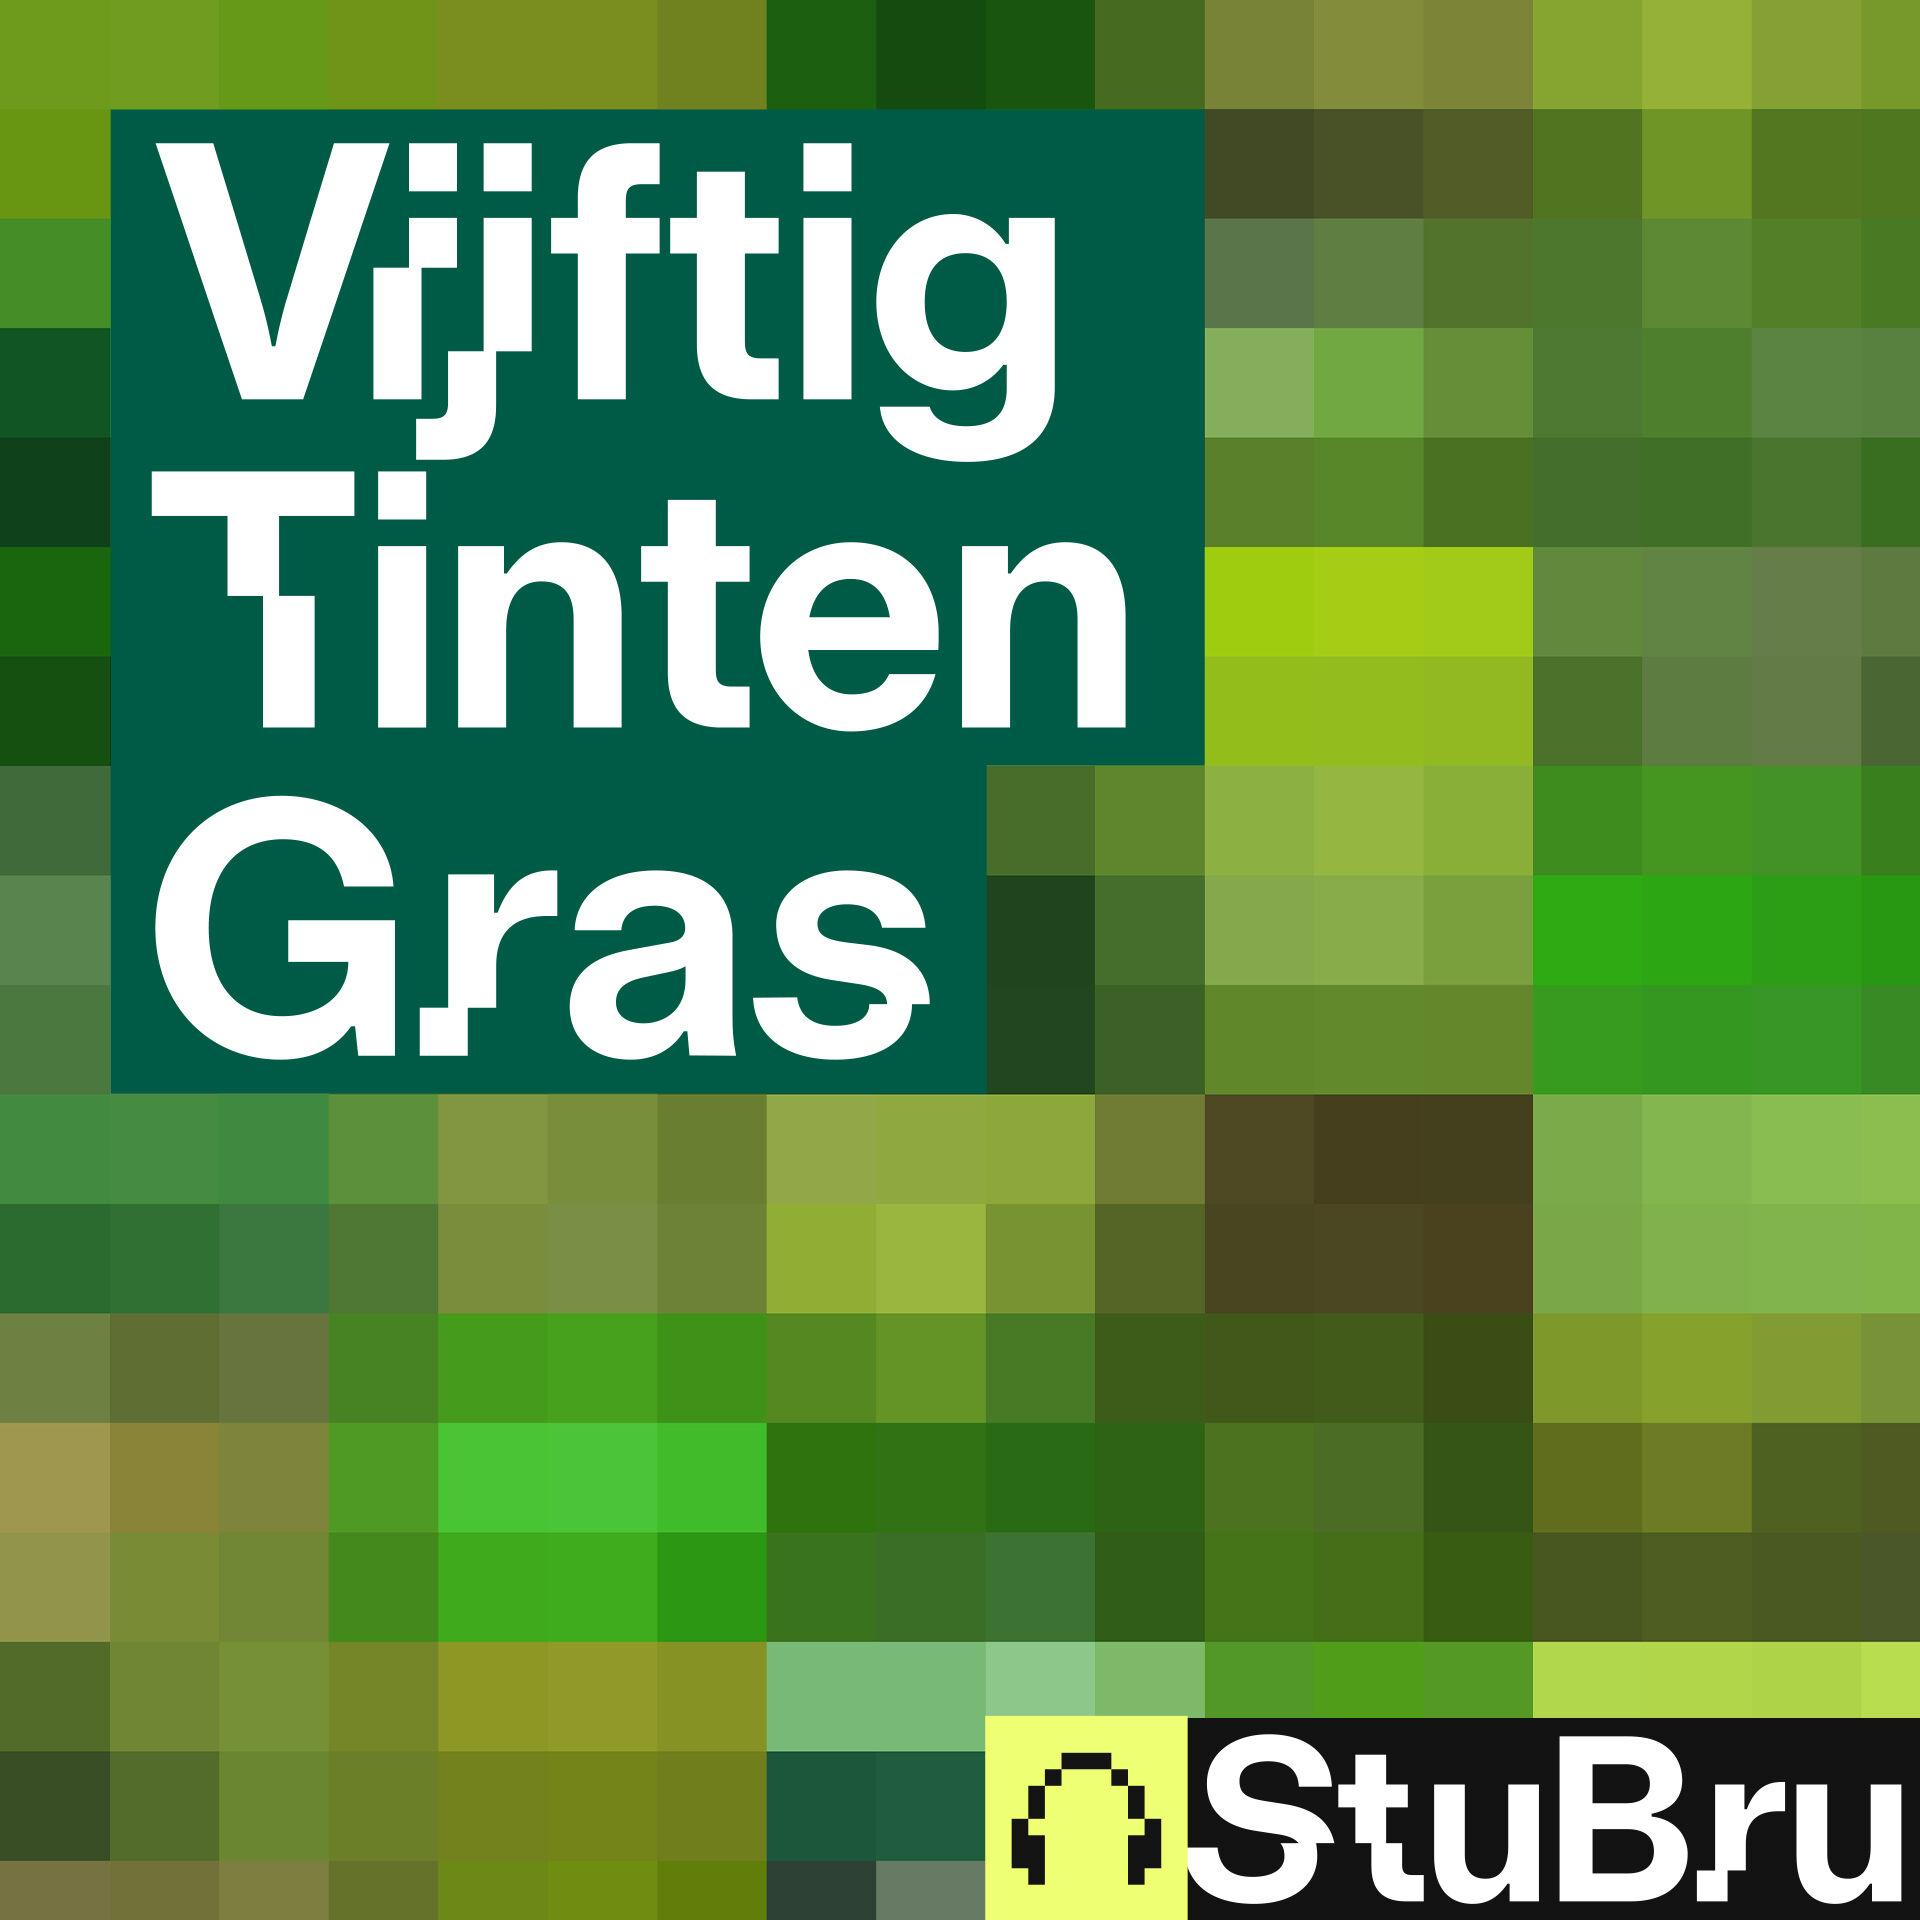 Vijfig Tinten Gras - Vanaf 3 juli